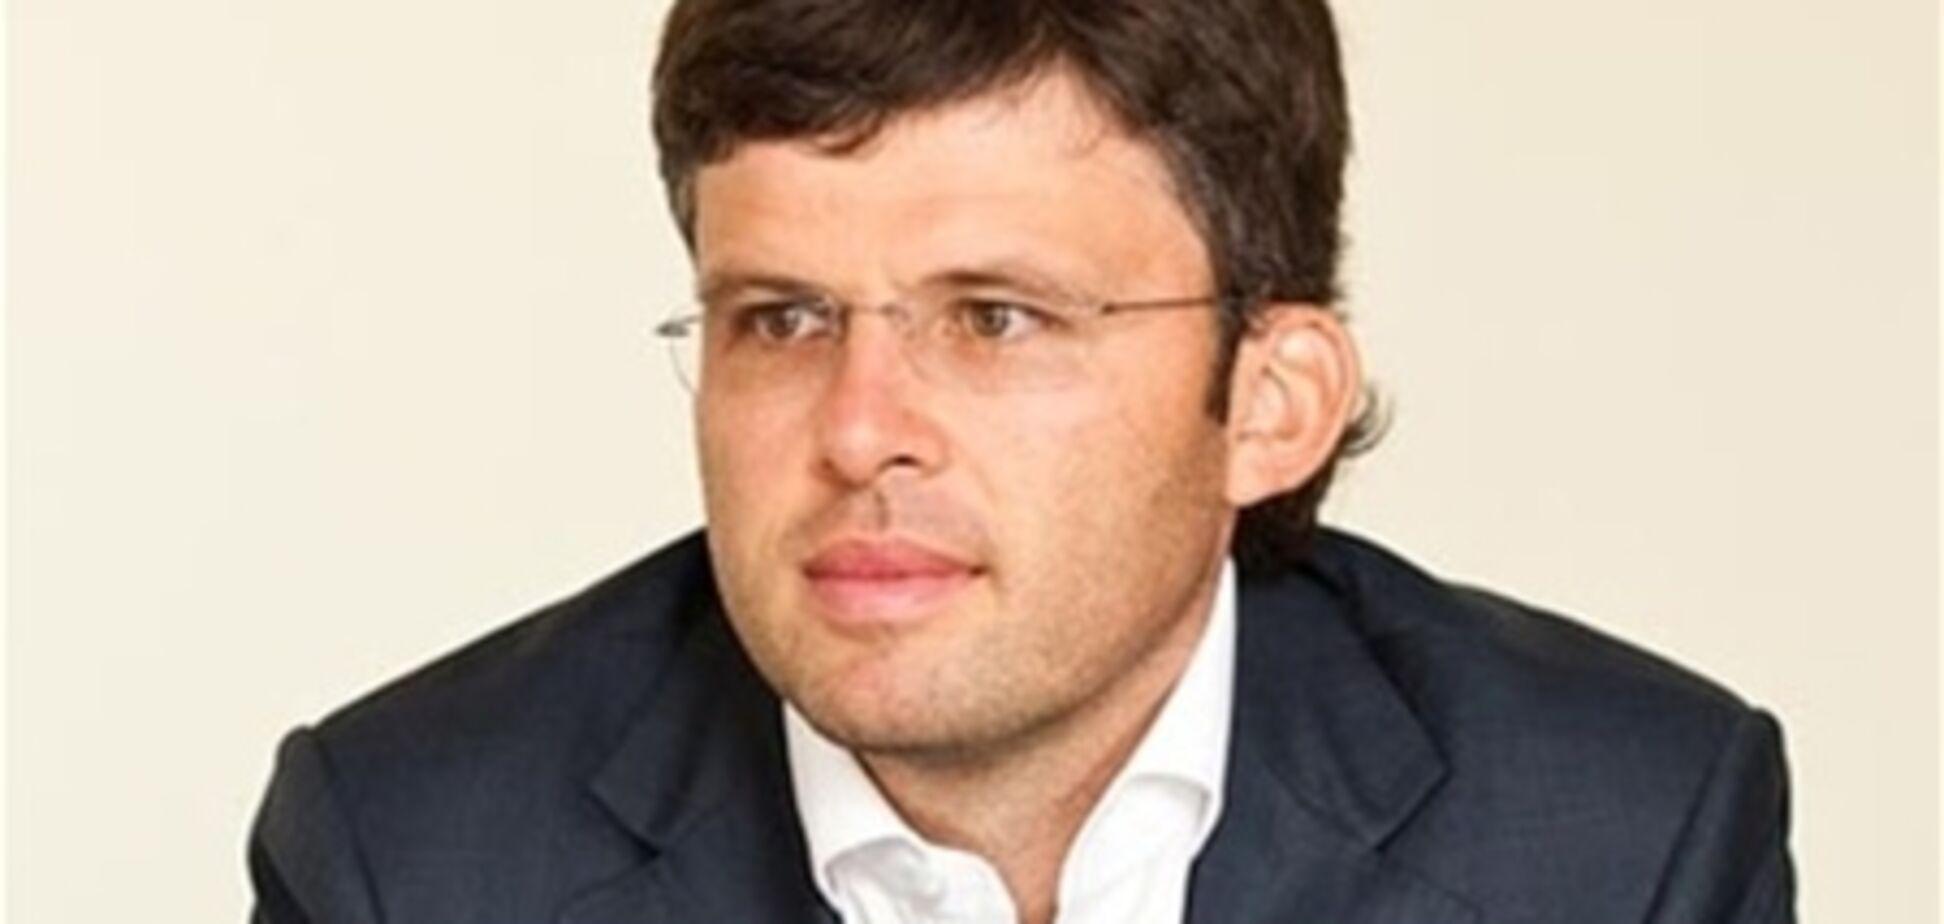 СМИ: фирму экс-нардепа Веревского оштрафовали почти на миллион гривен